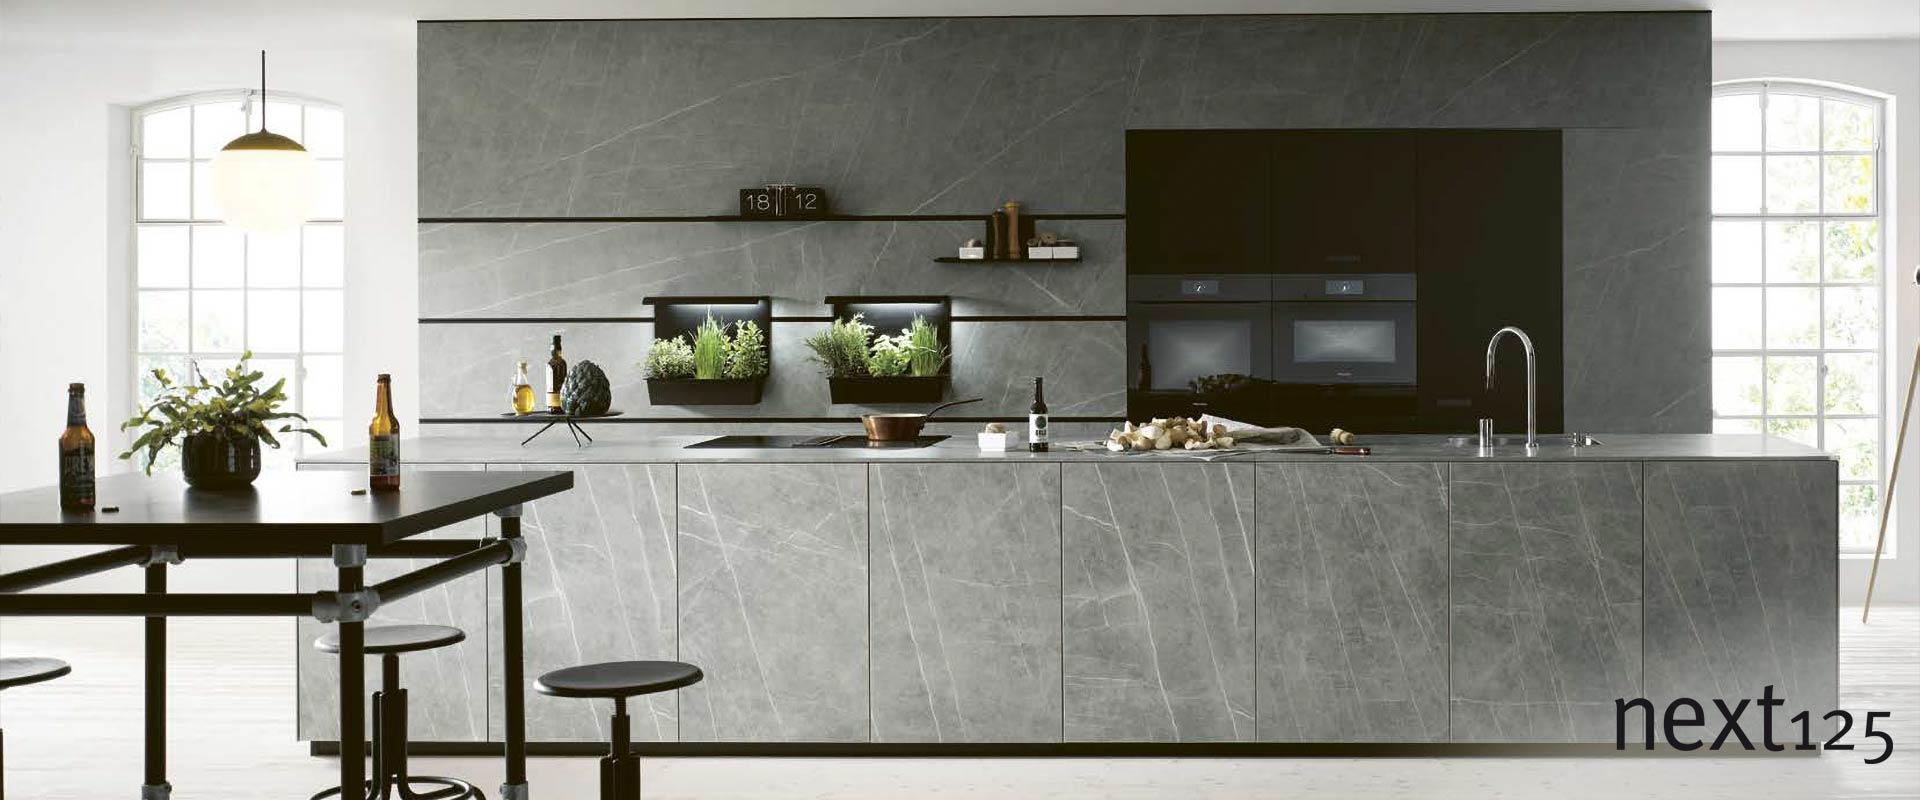 neubigs k chenstudio next125 k chen. Black Bedroom Furniture Sets. Home Design Ideas